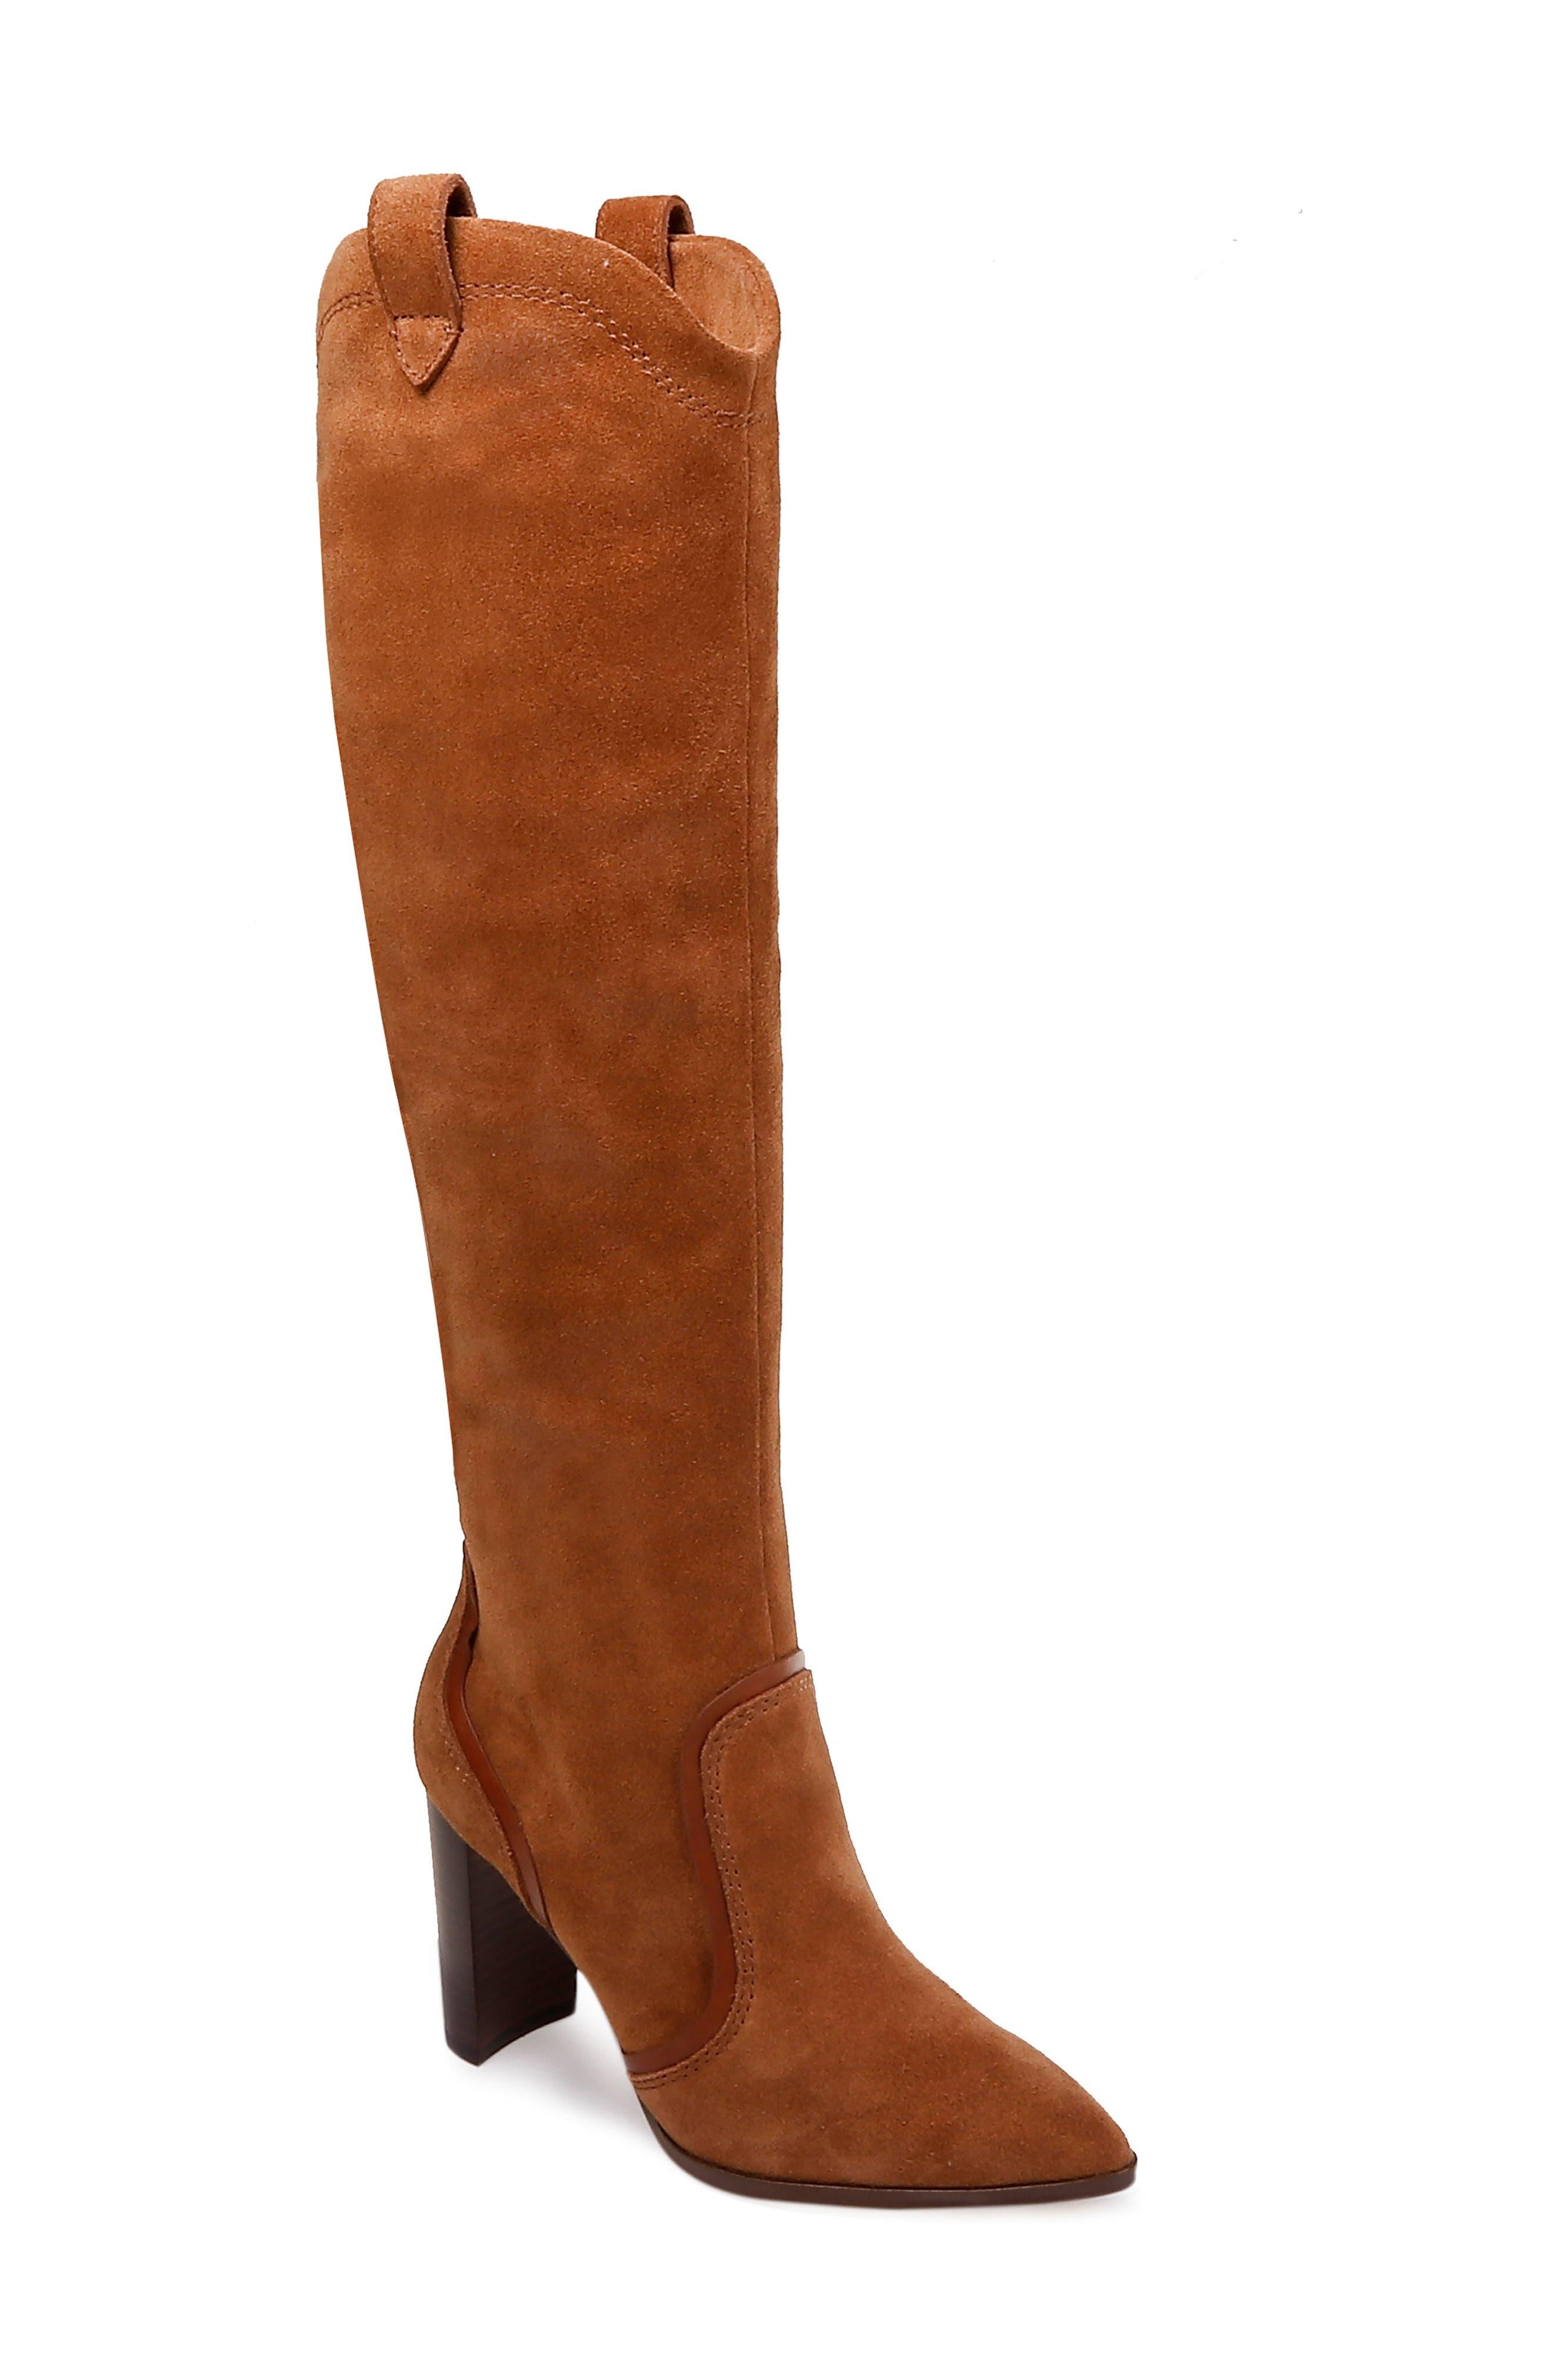 Splendid Caren Knee High Boot, Brown